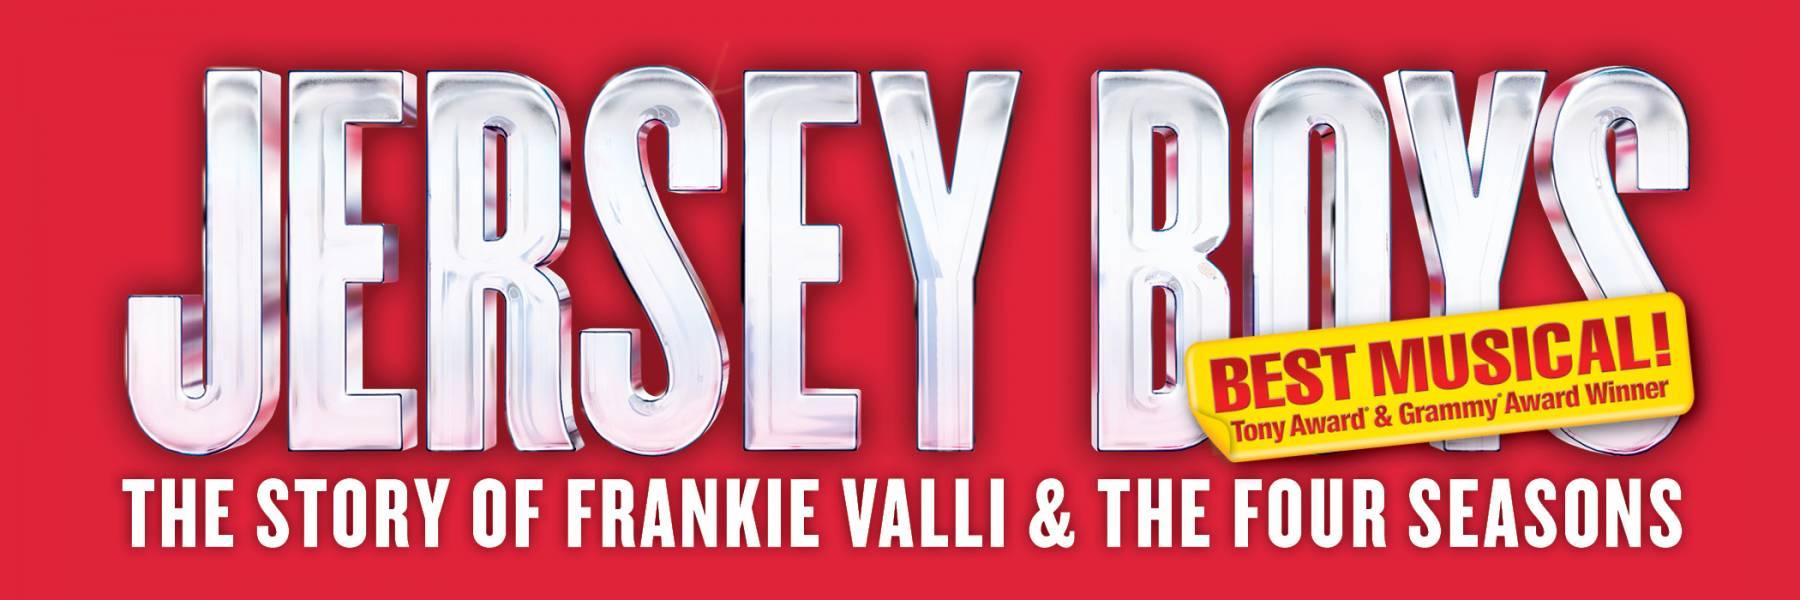 Jersey Boys show logo